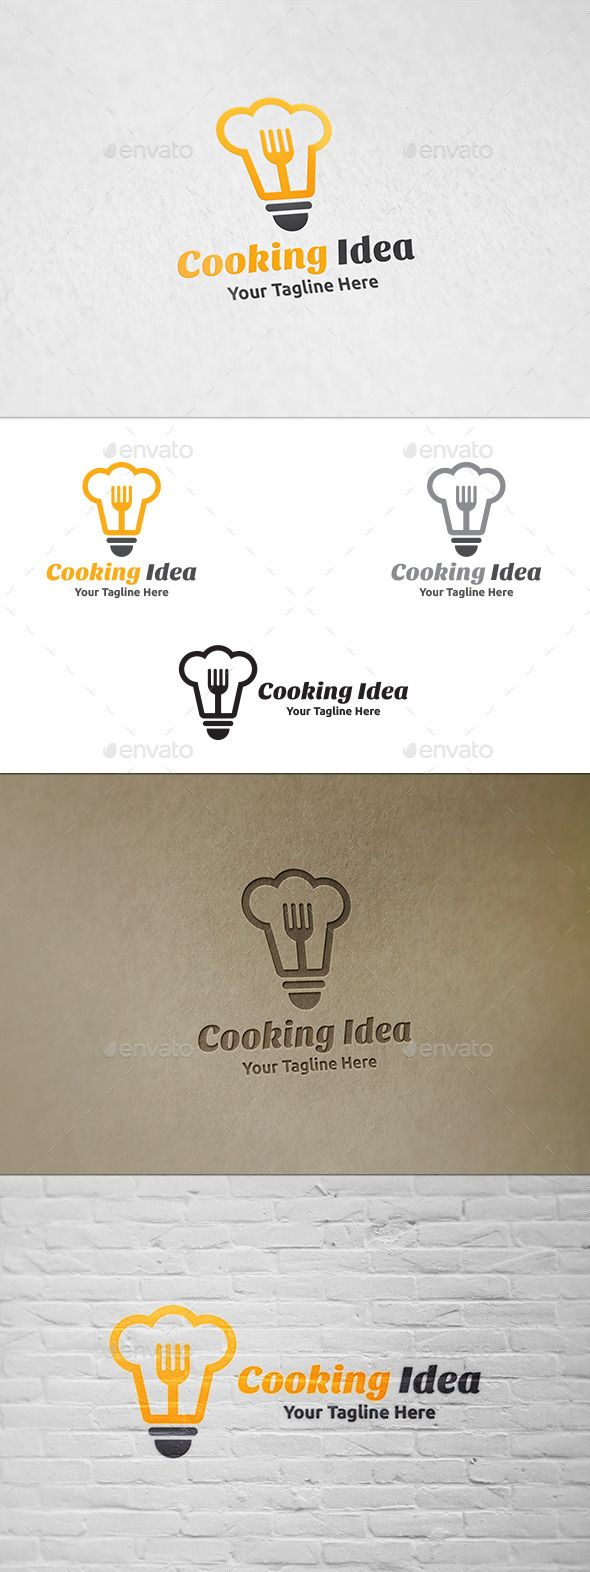 Cooking Idea - Logo Template